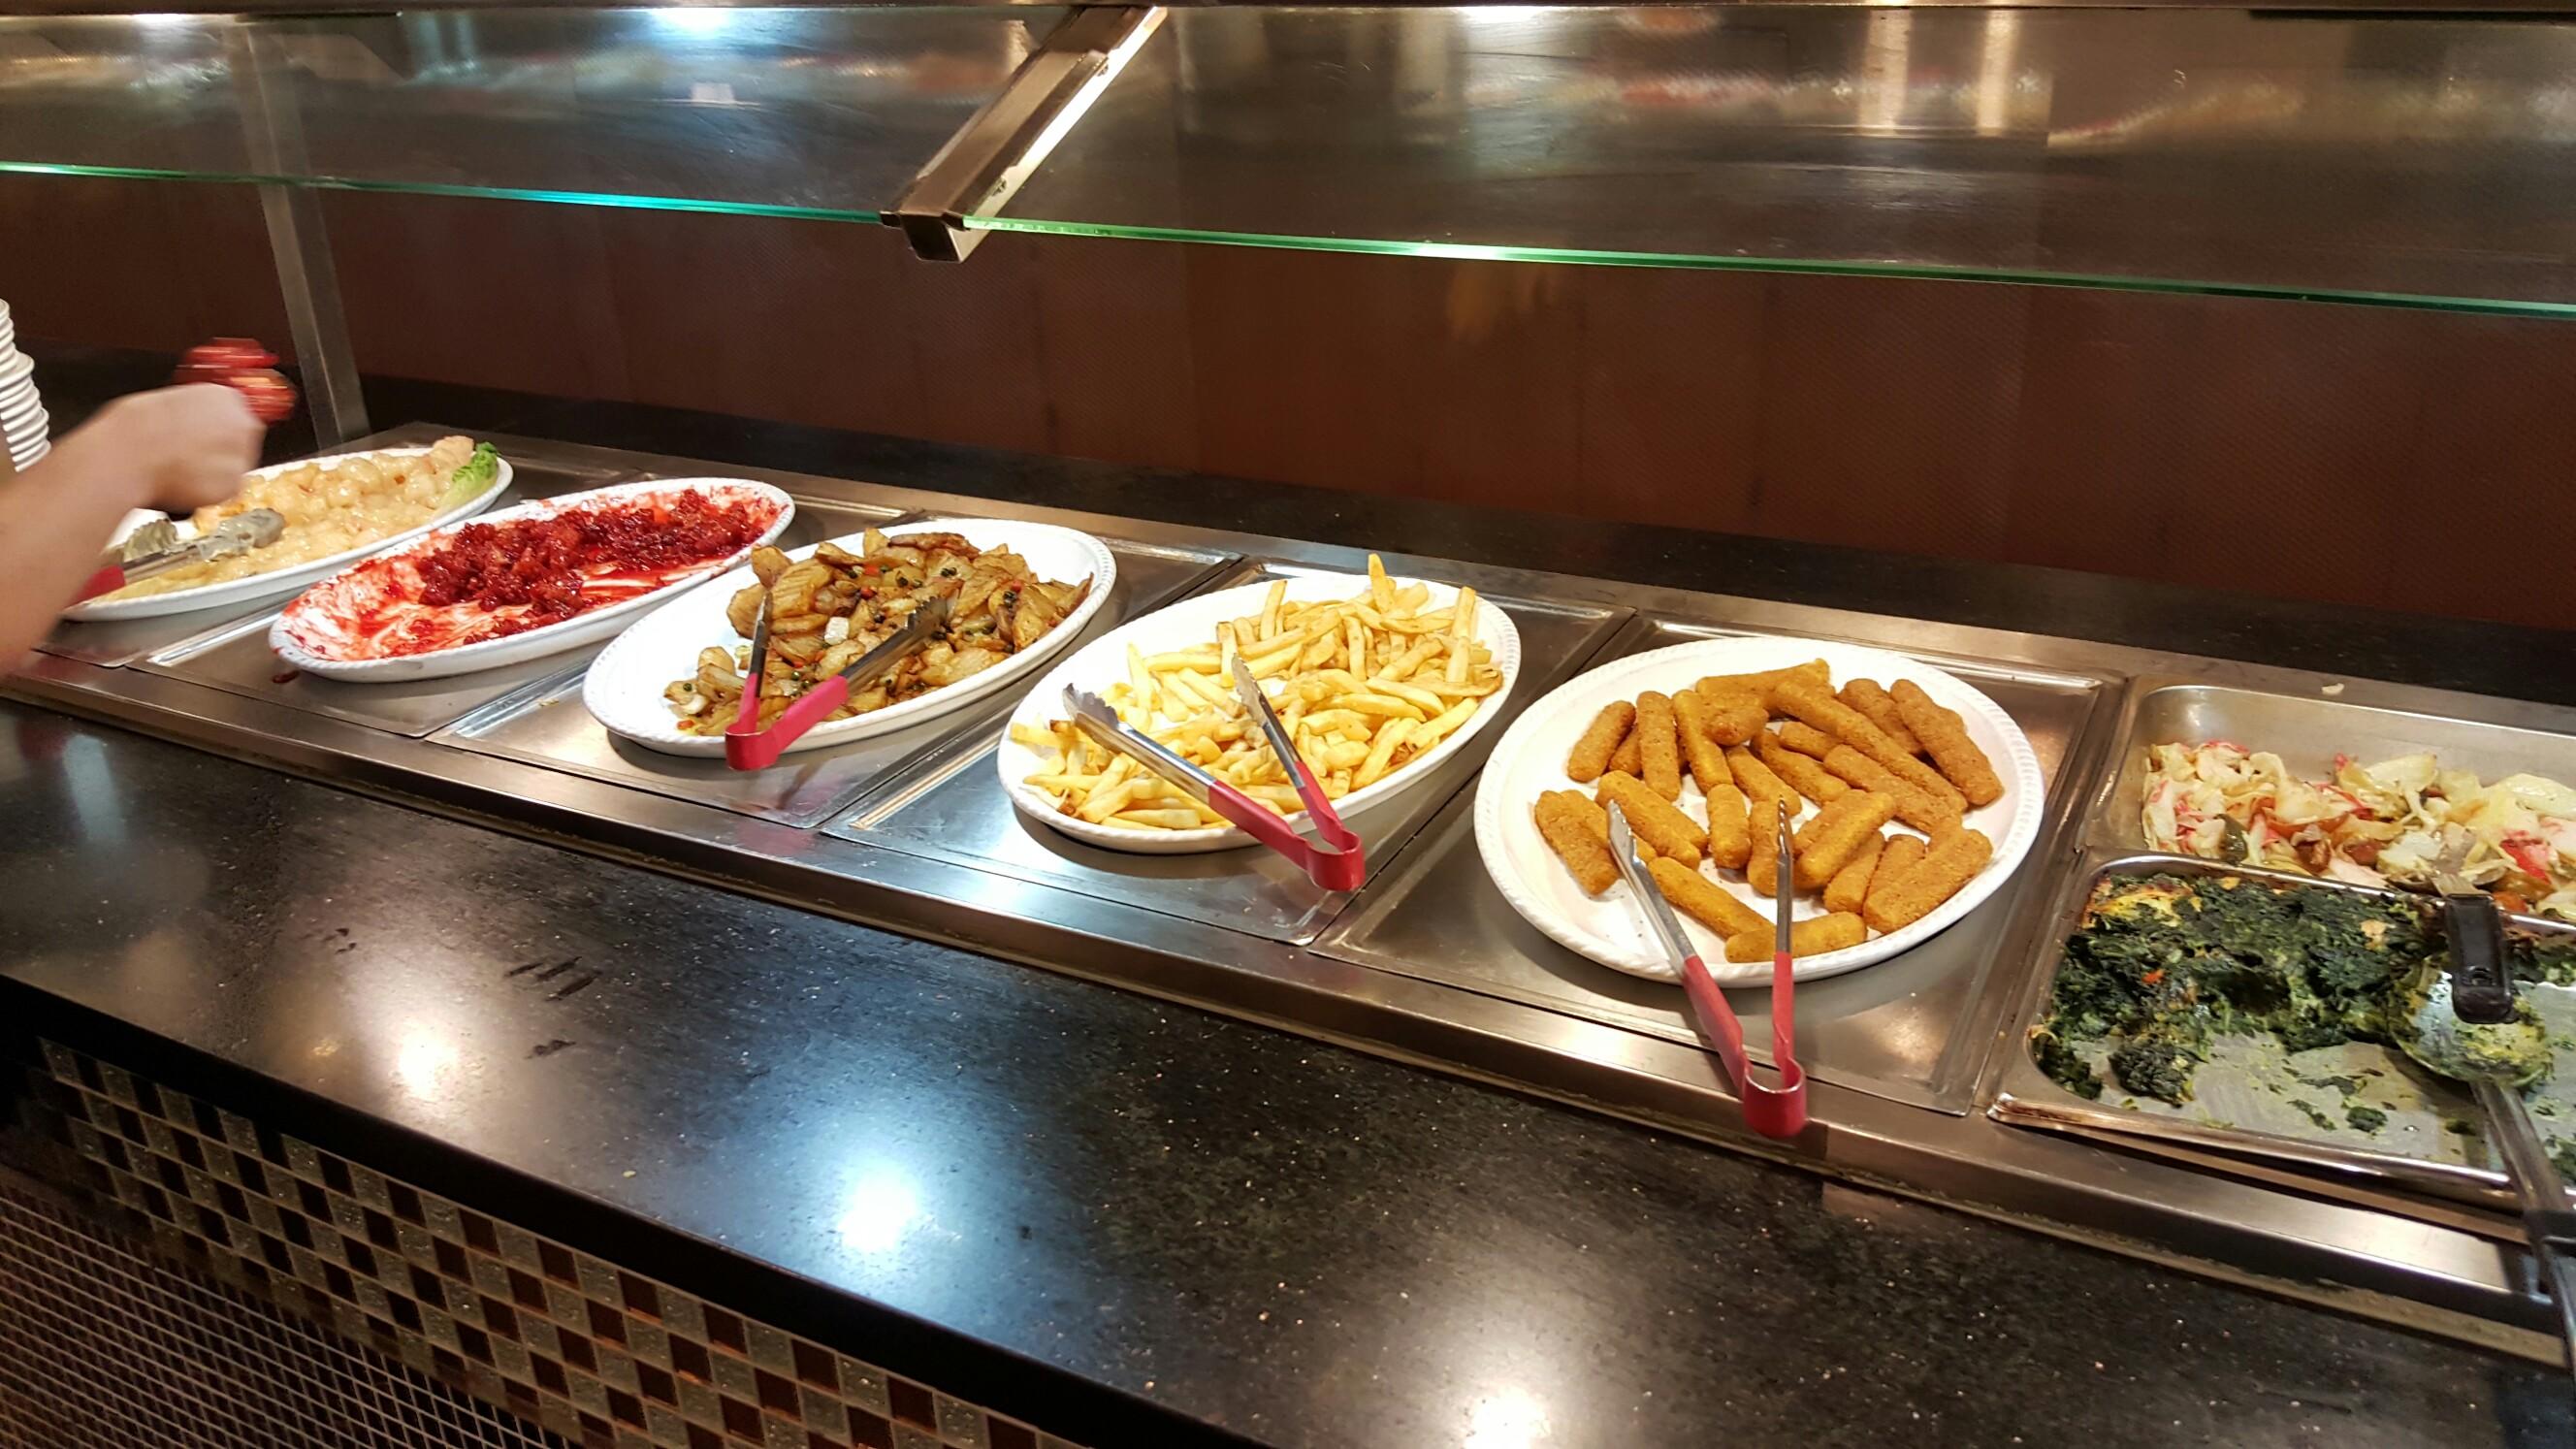 bc osaka 2999 e lincoln hwy merrillville in 46410 yp com rh yellowpages com osaka buffet moline coupons osaka buffet bolingbrook coupon